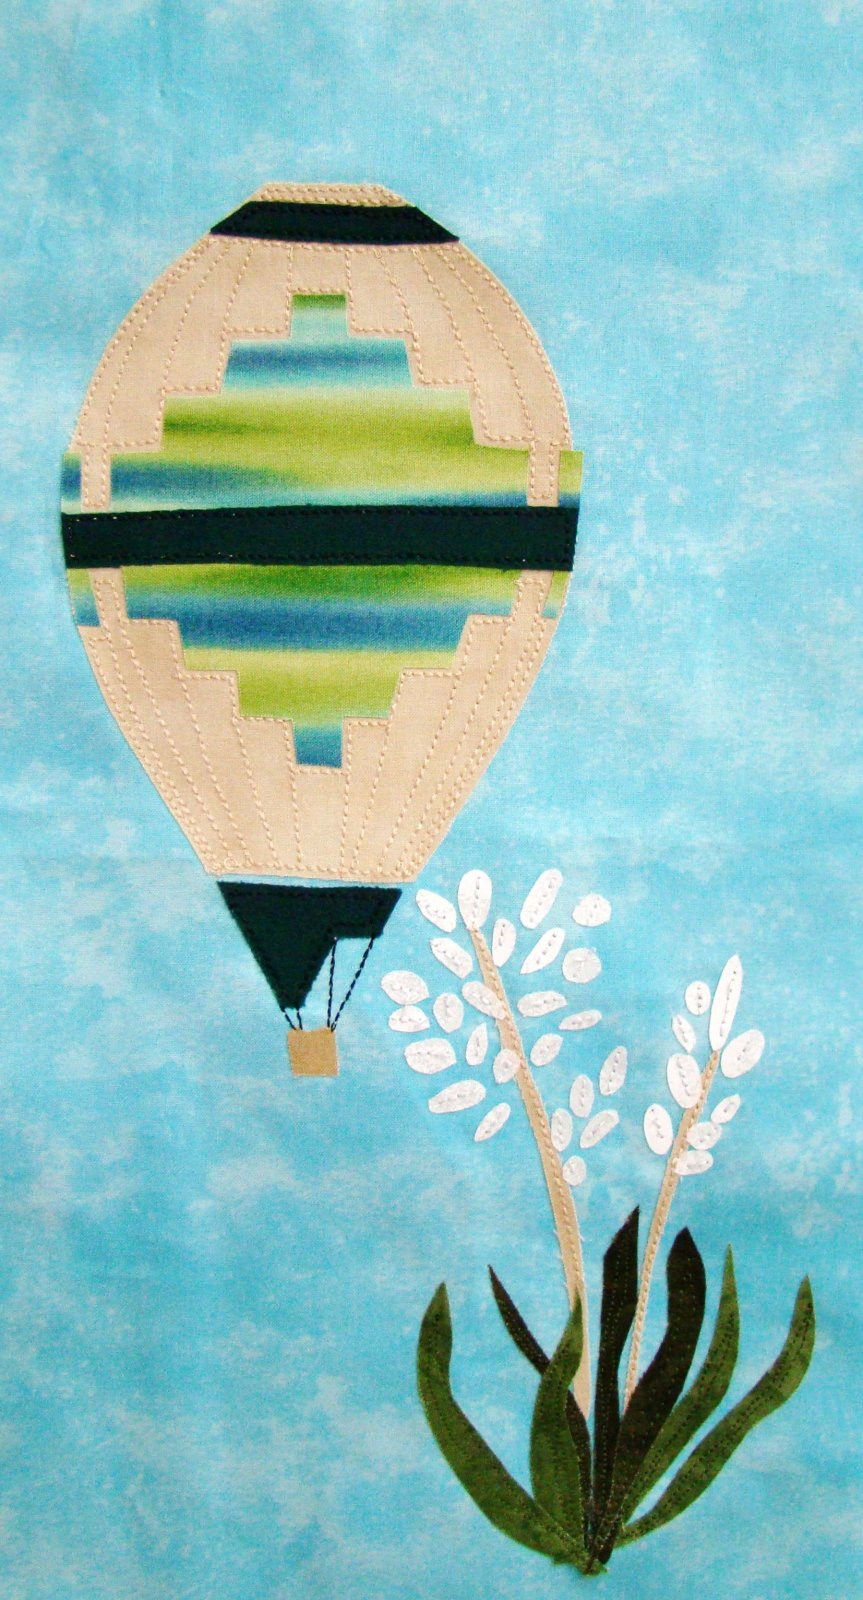 Beautiful Balloons #9 - Yucca